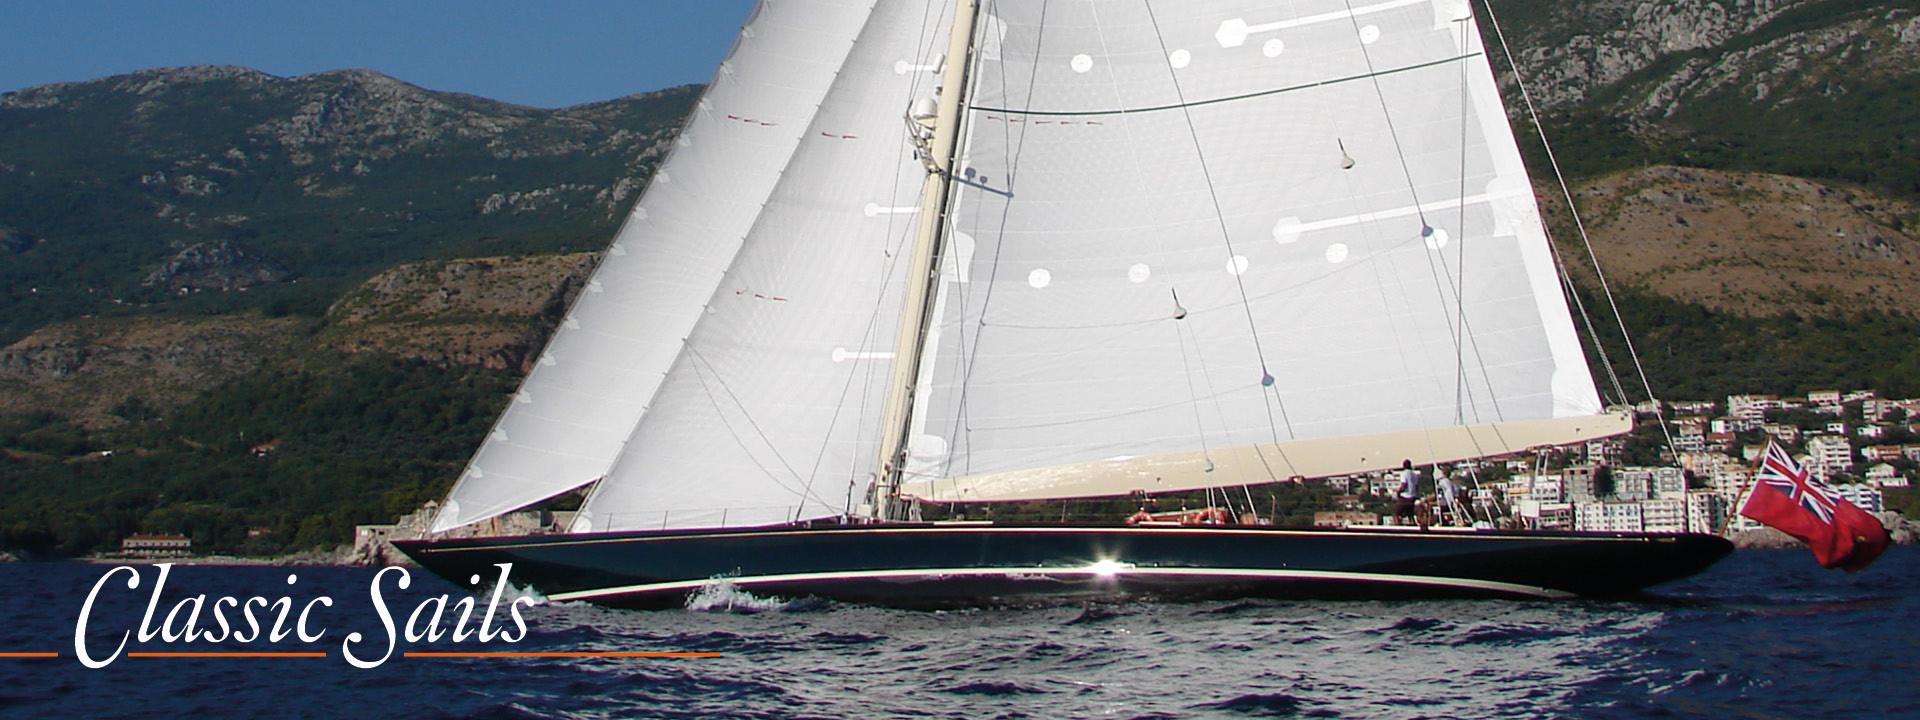 Classic yachts sails